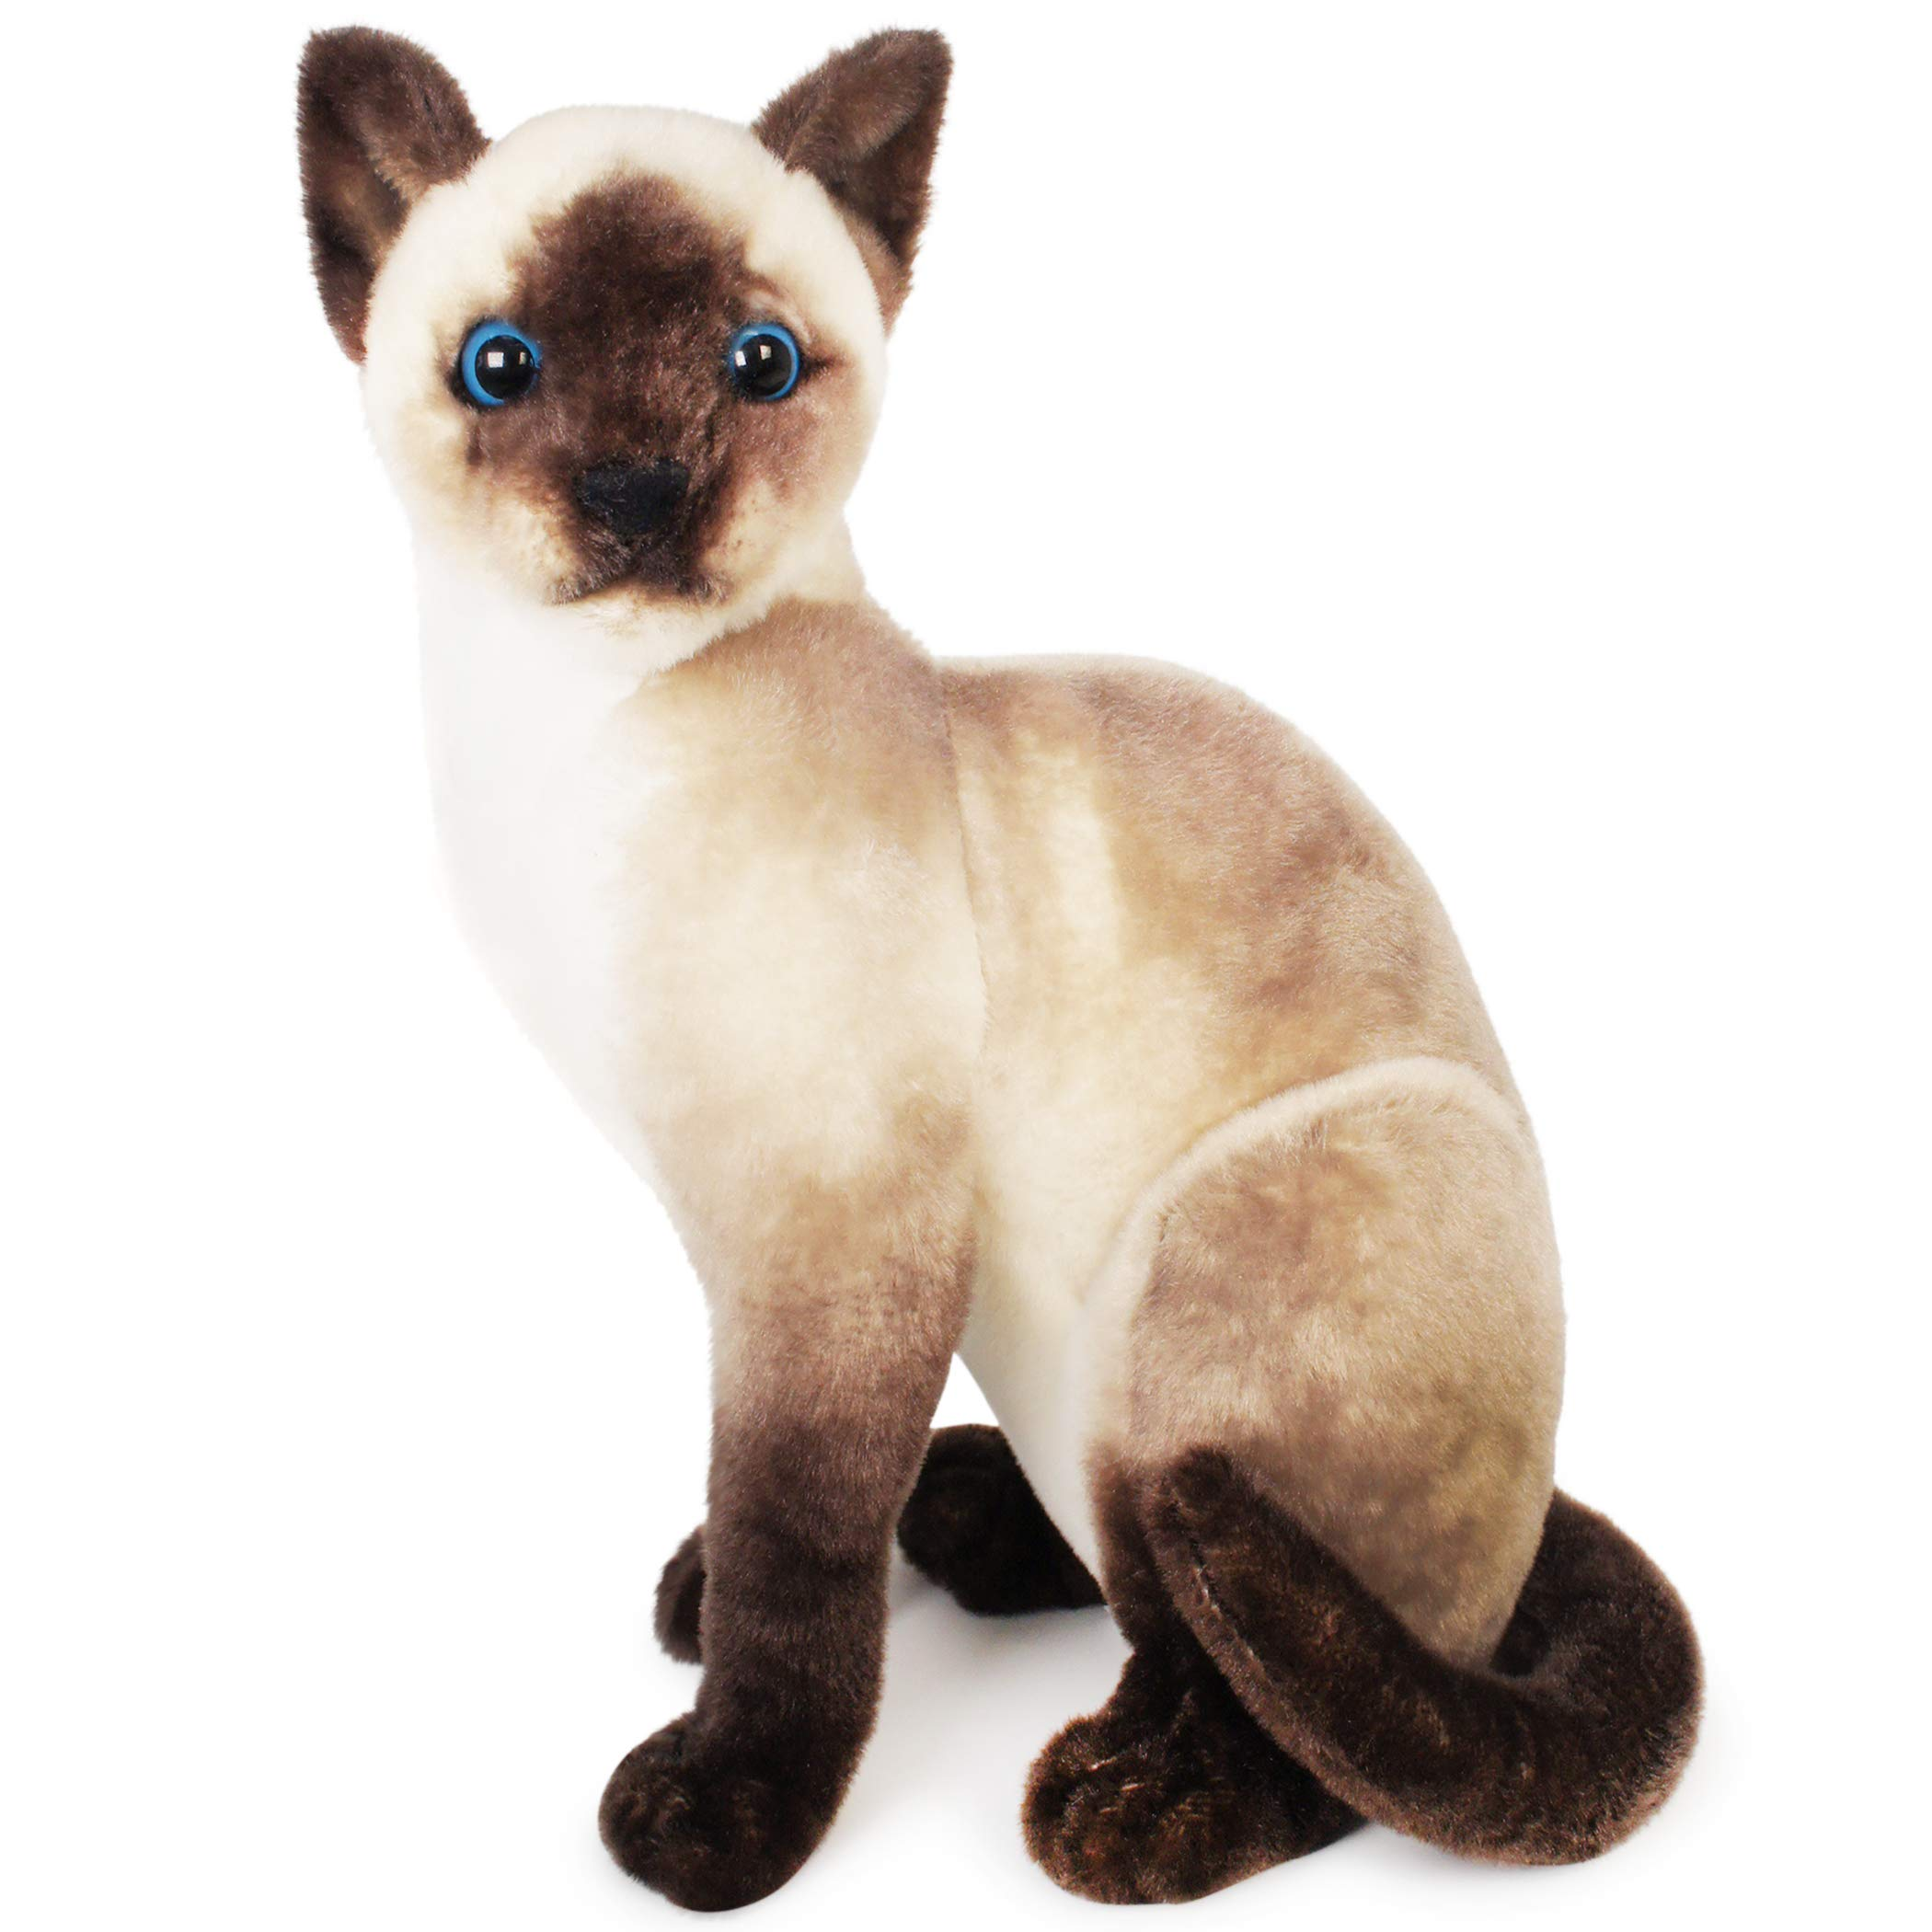 VIAHART Stefan The Siamese Cat | 14 Inch Stuffed Animal